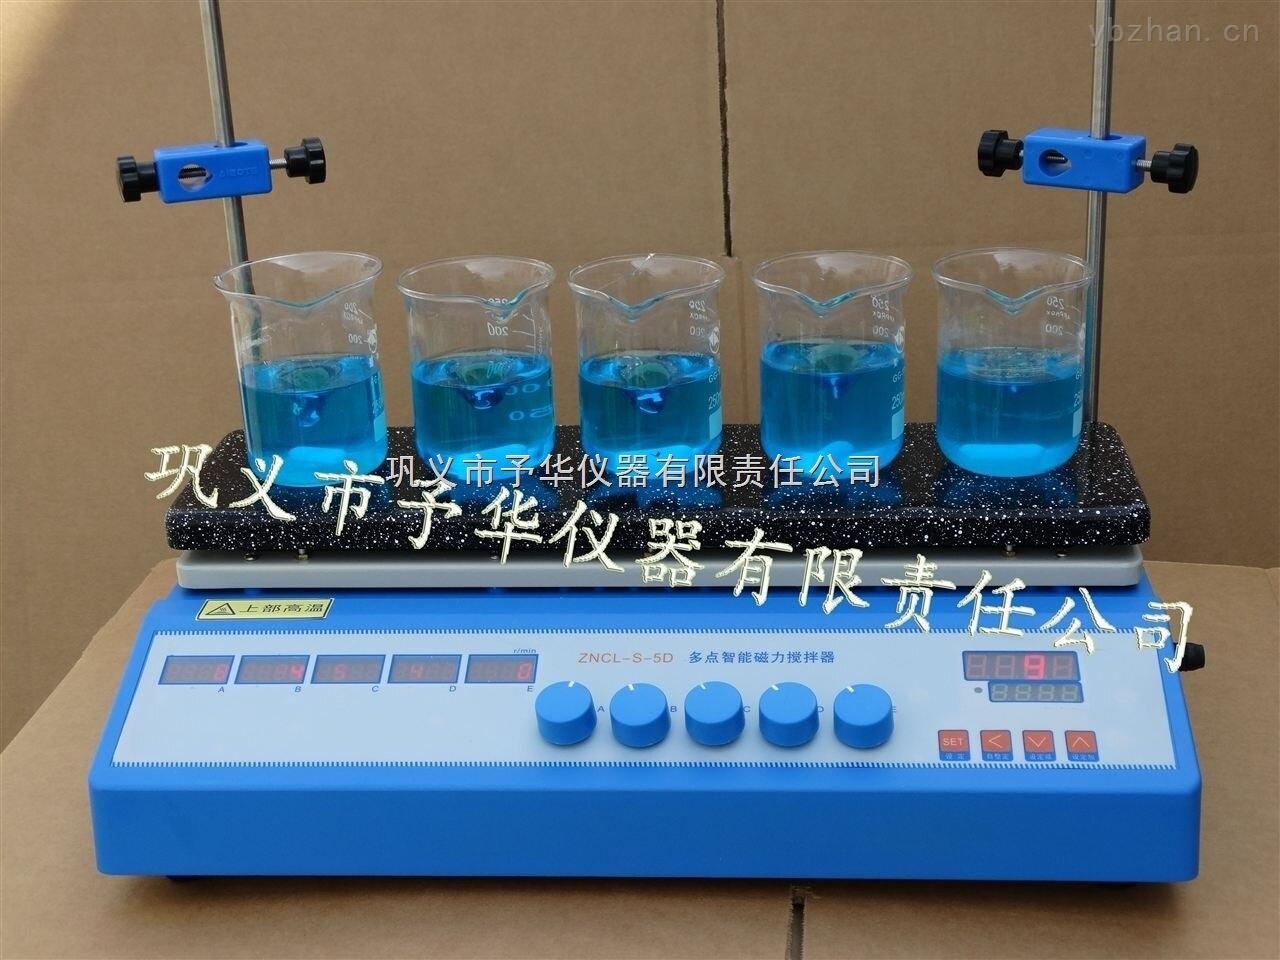 ZNCL-S-智能恒温多点磁力搅拌器结构合理,经久耐用